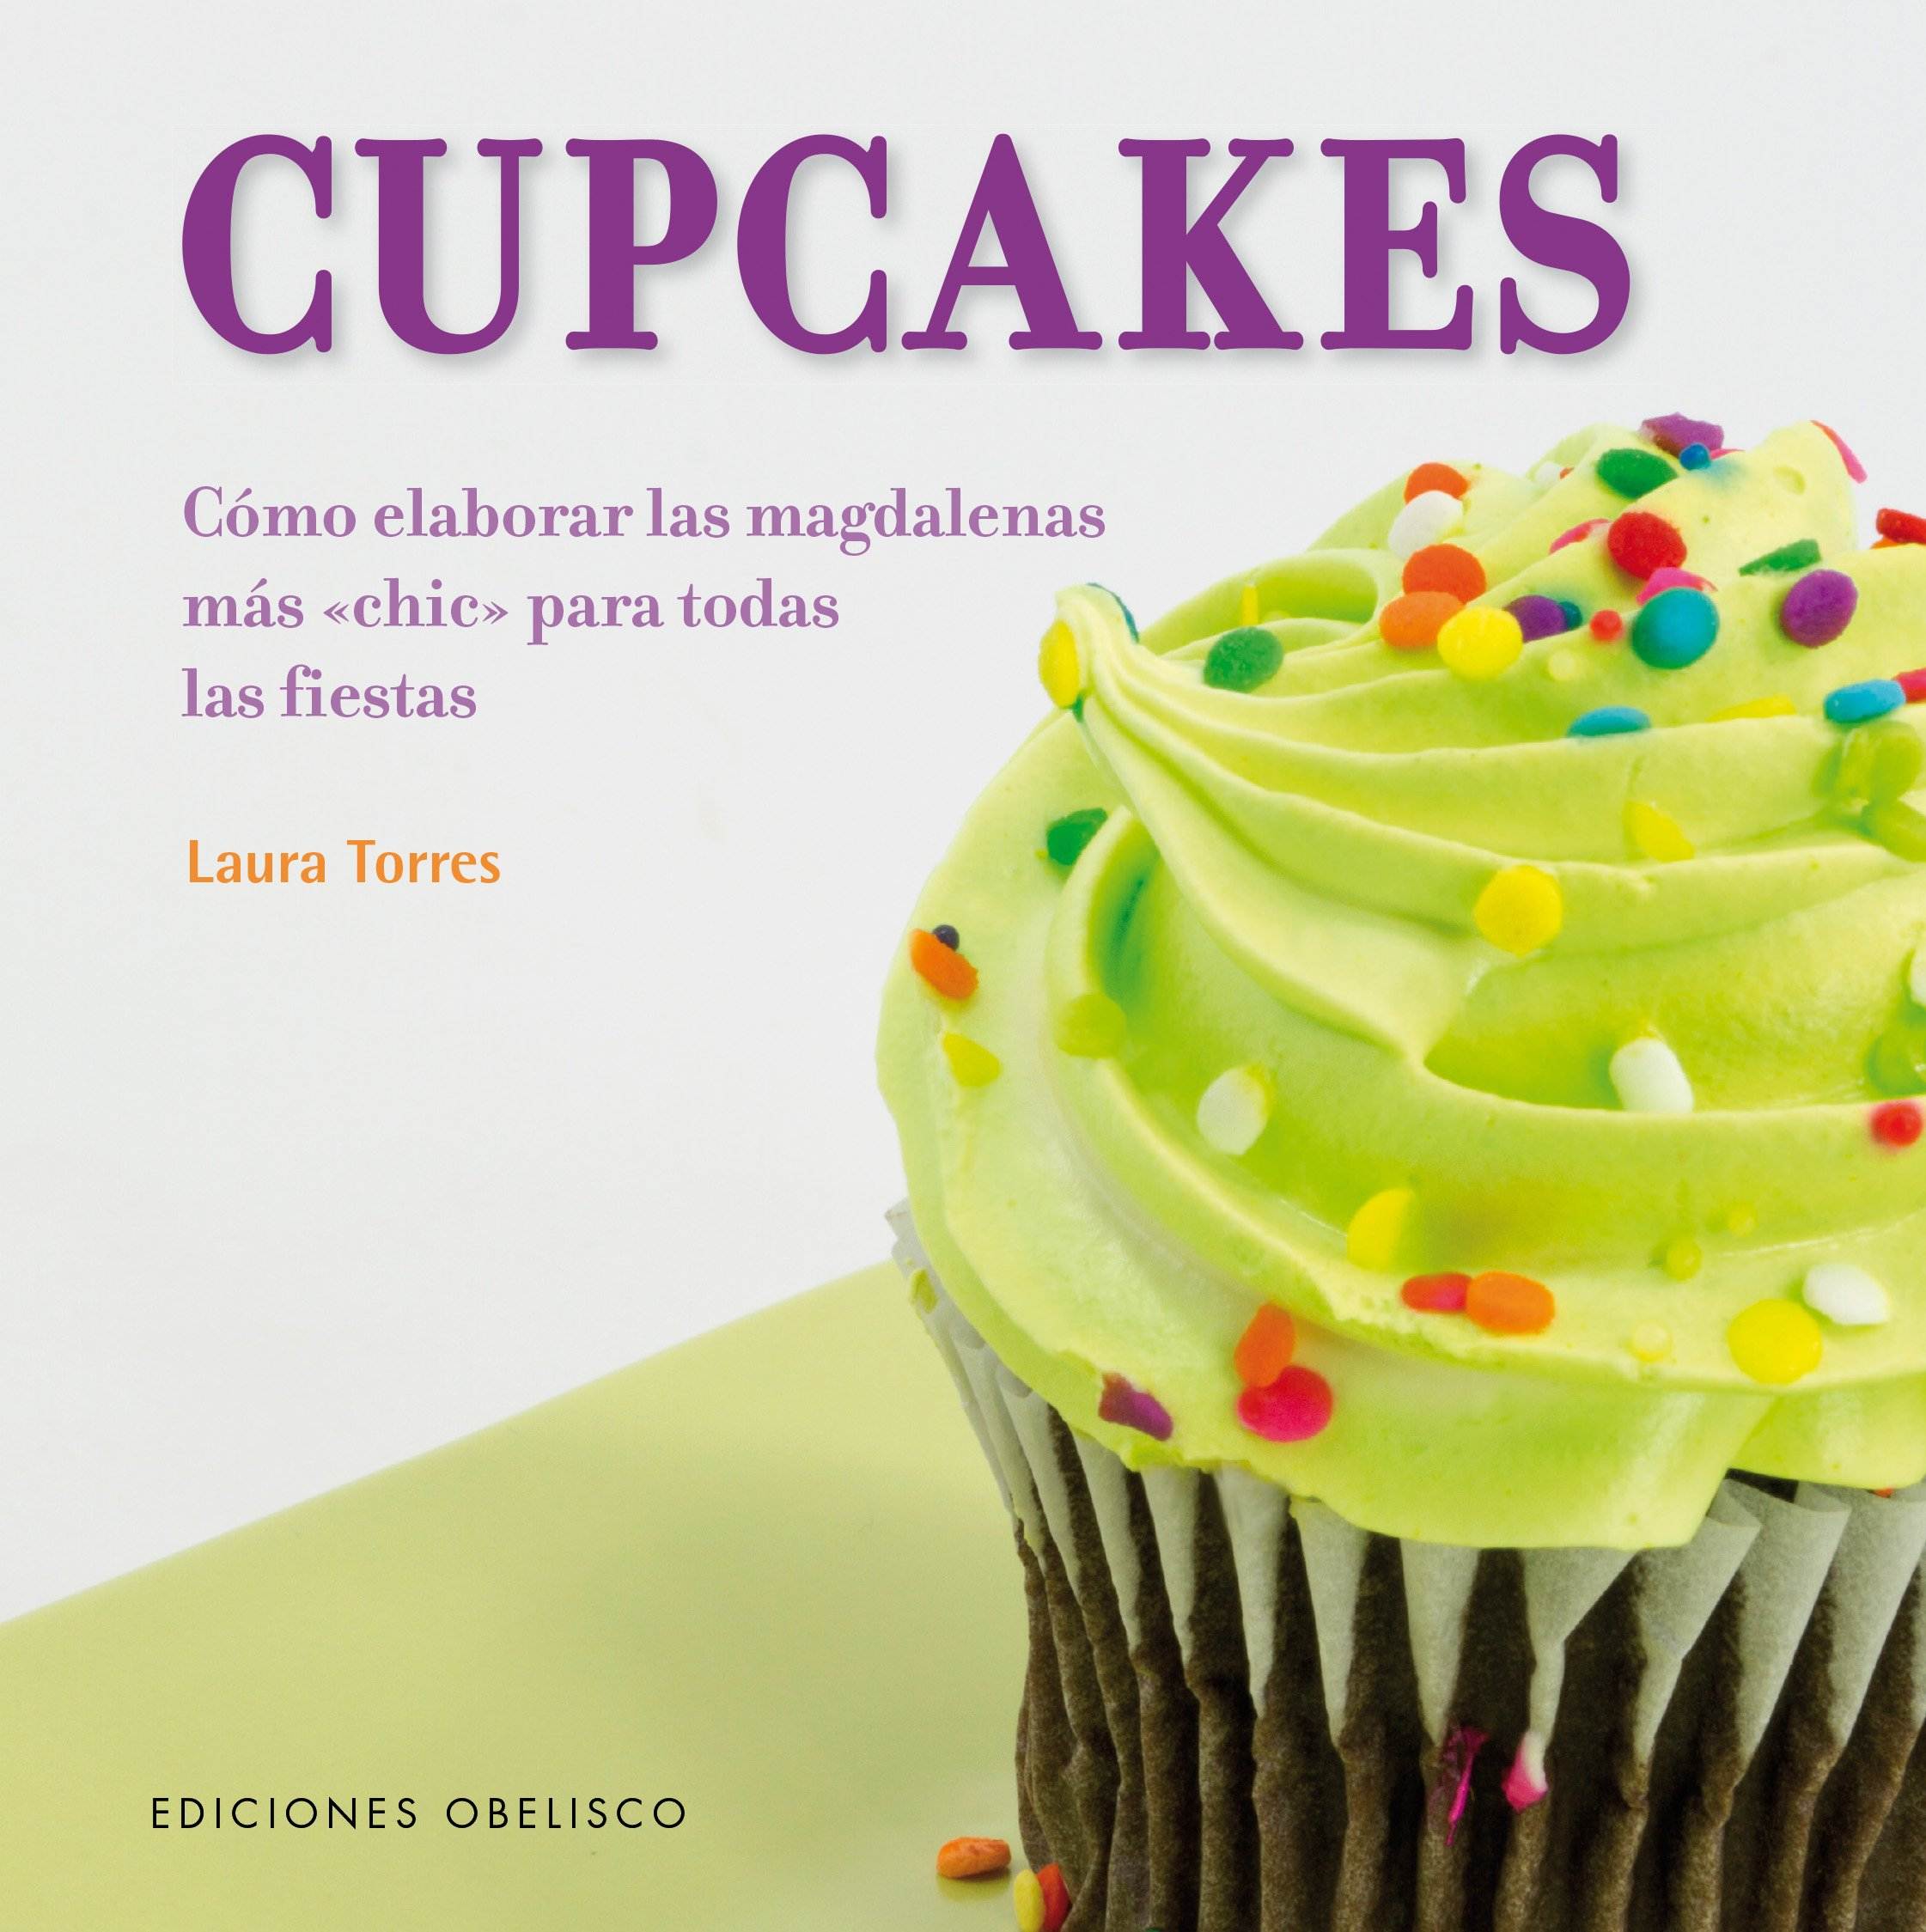 Cupcakes (Spanish Edition) (Spanish) Hardcover – February 28, 2017